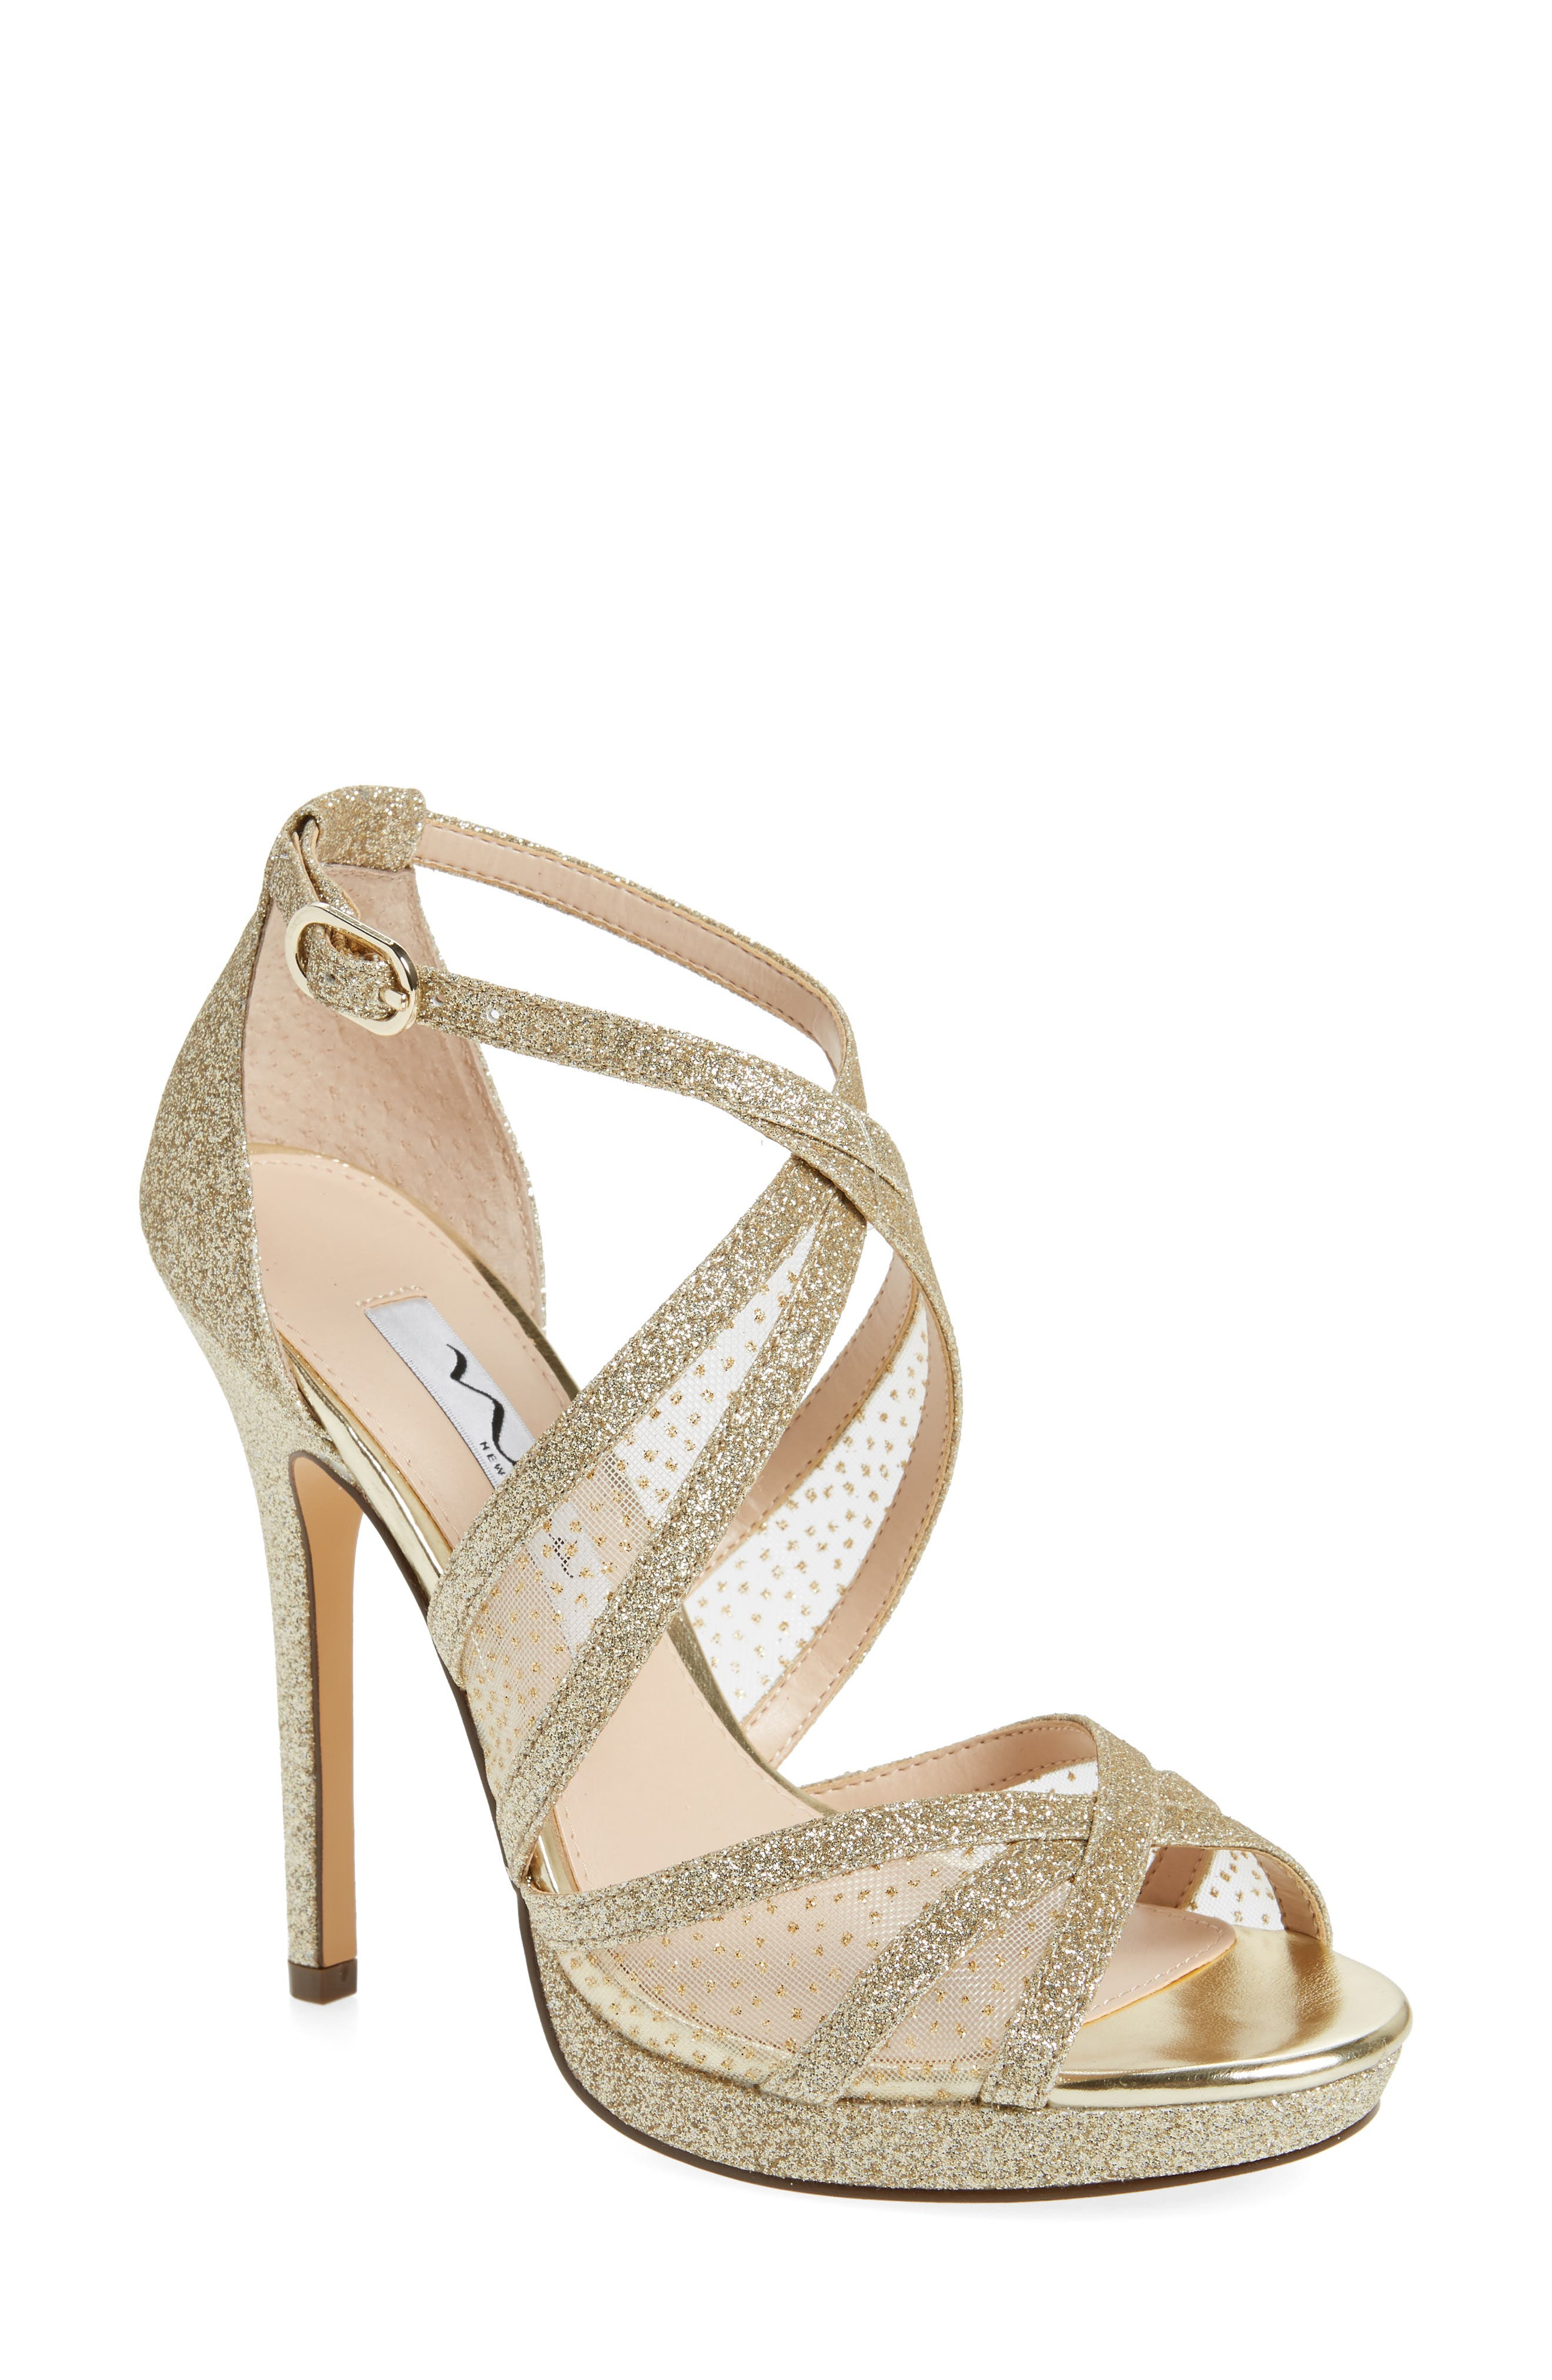 NINA, Fenna Strappy Platform Sandal, Main thumbnail 1, color, GOLD GLITTER FABRIC